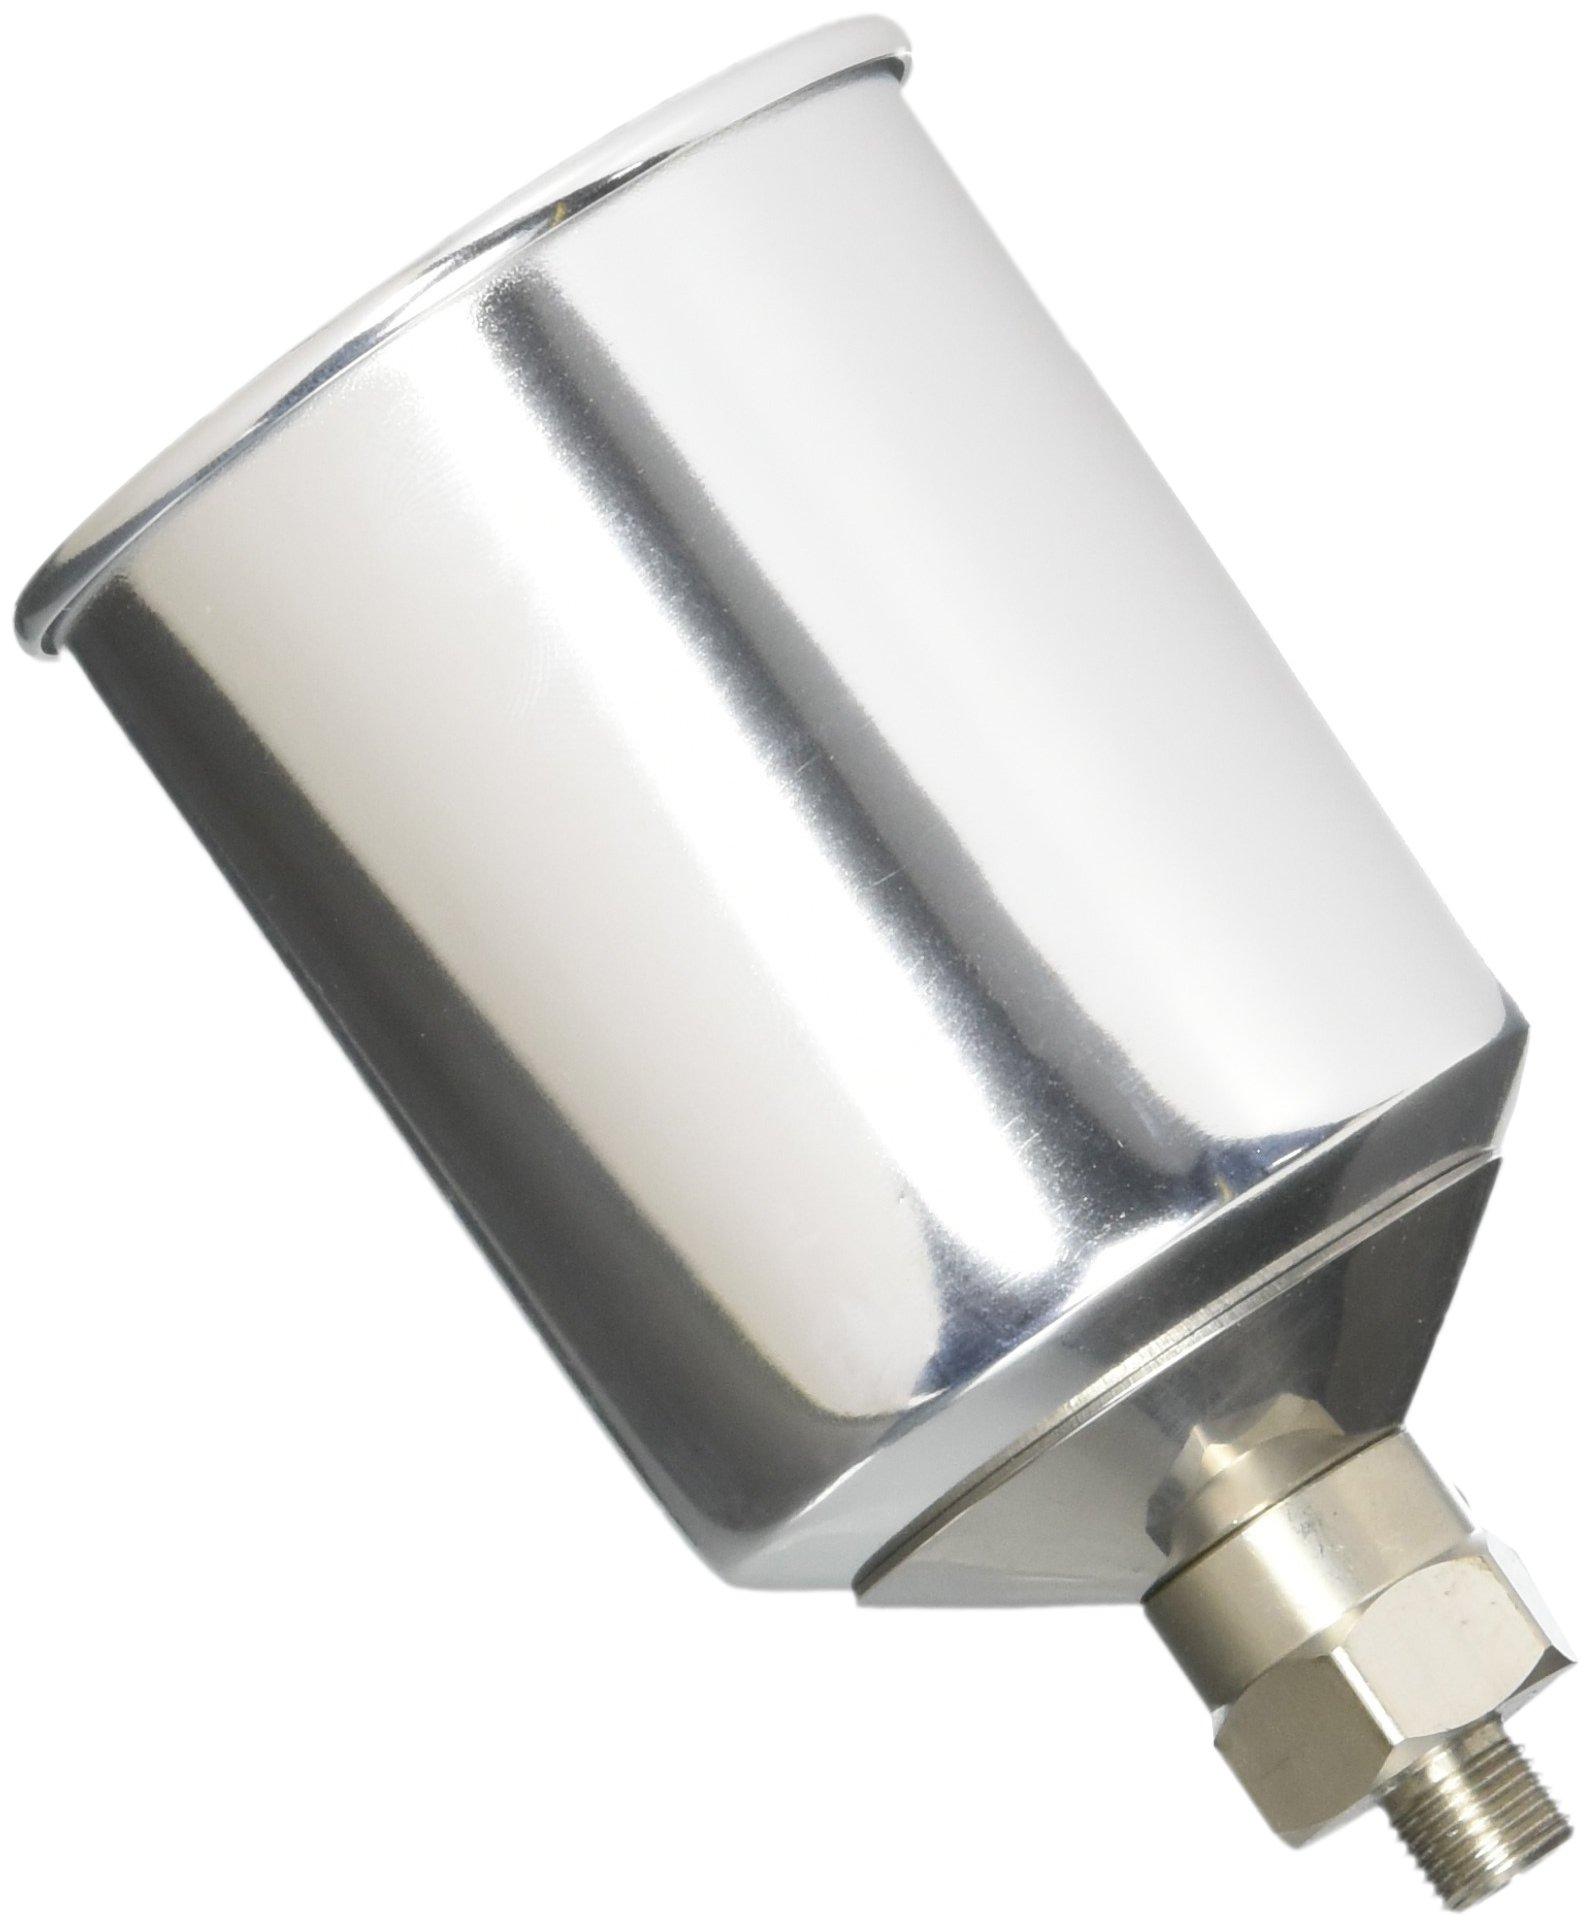 ANEST IWATA PCG-2D-1 150ml Aluminium Gravity Cup for LPH-80 Spray Guns Japan